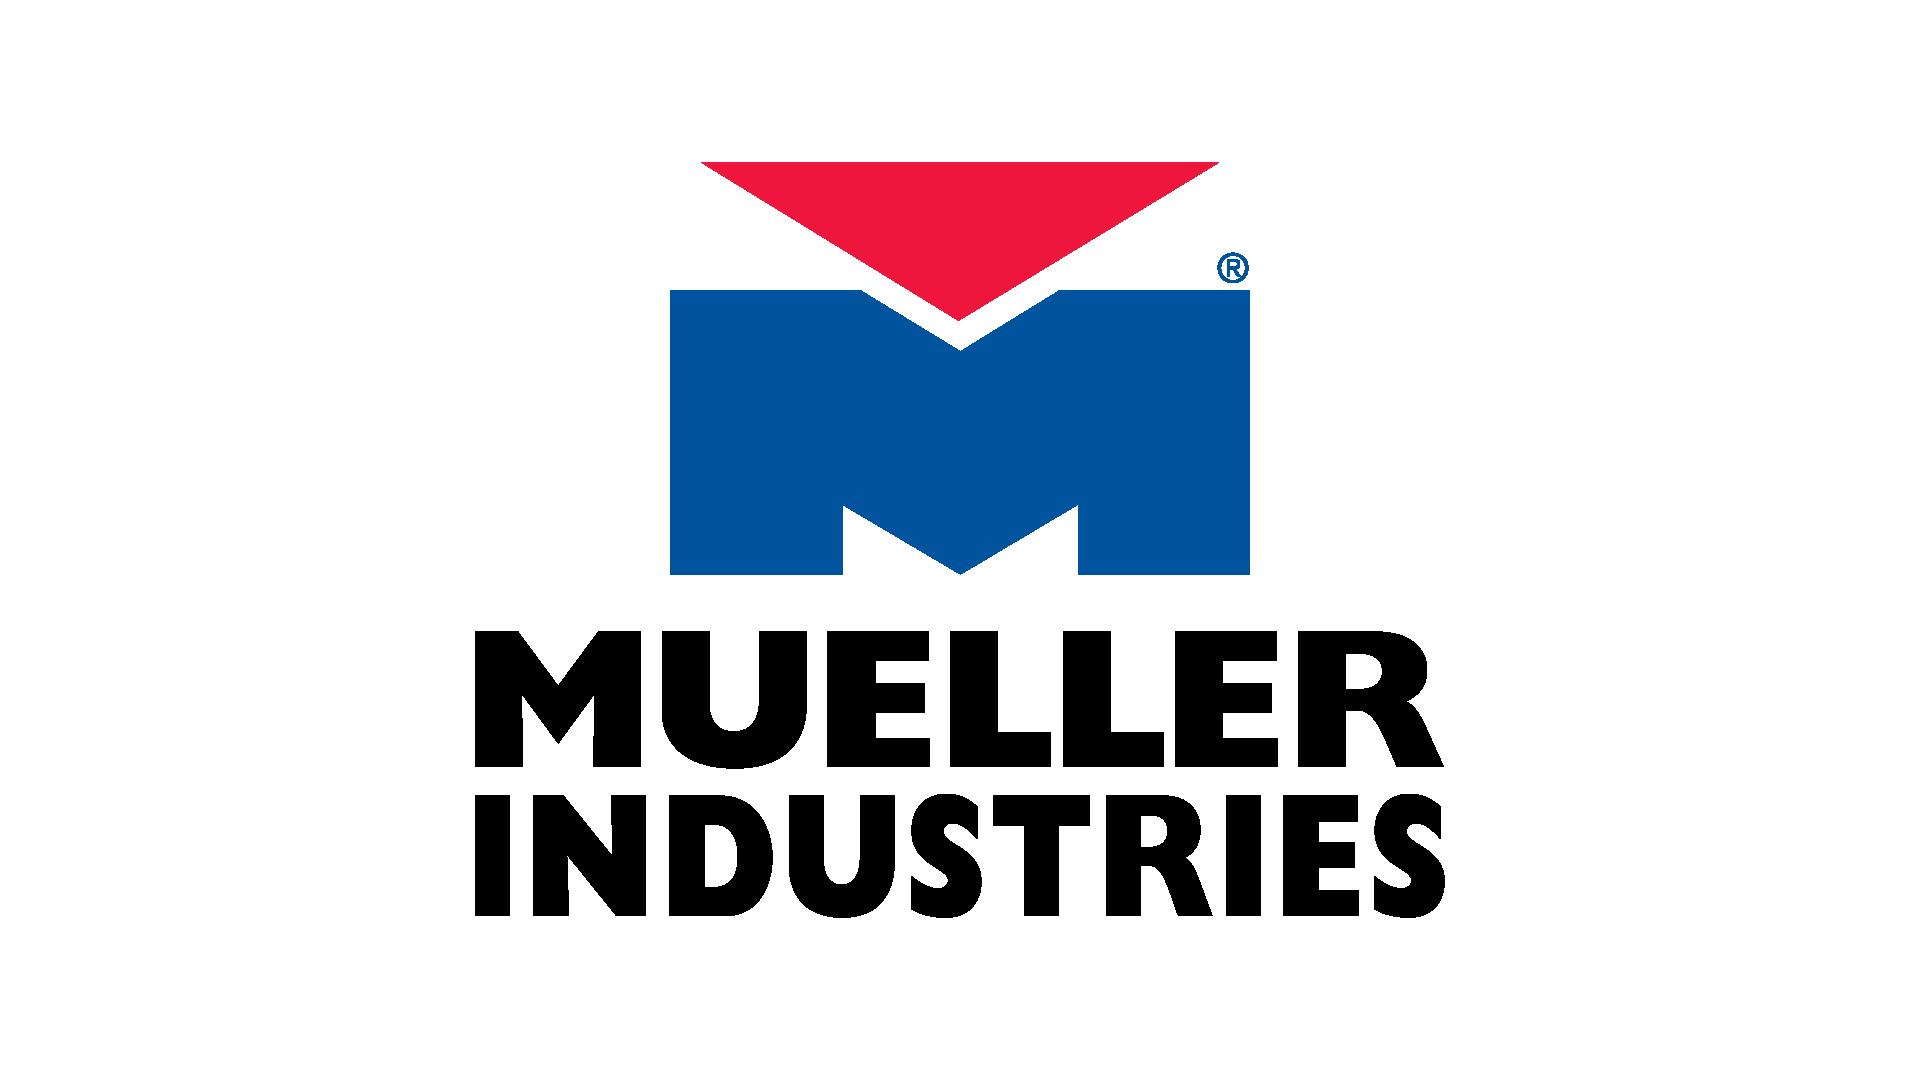 Mueller Industries Inc  (NYSE: MLI) Celebrates their 100th